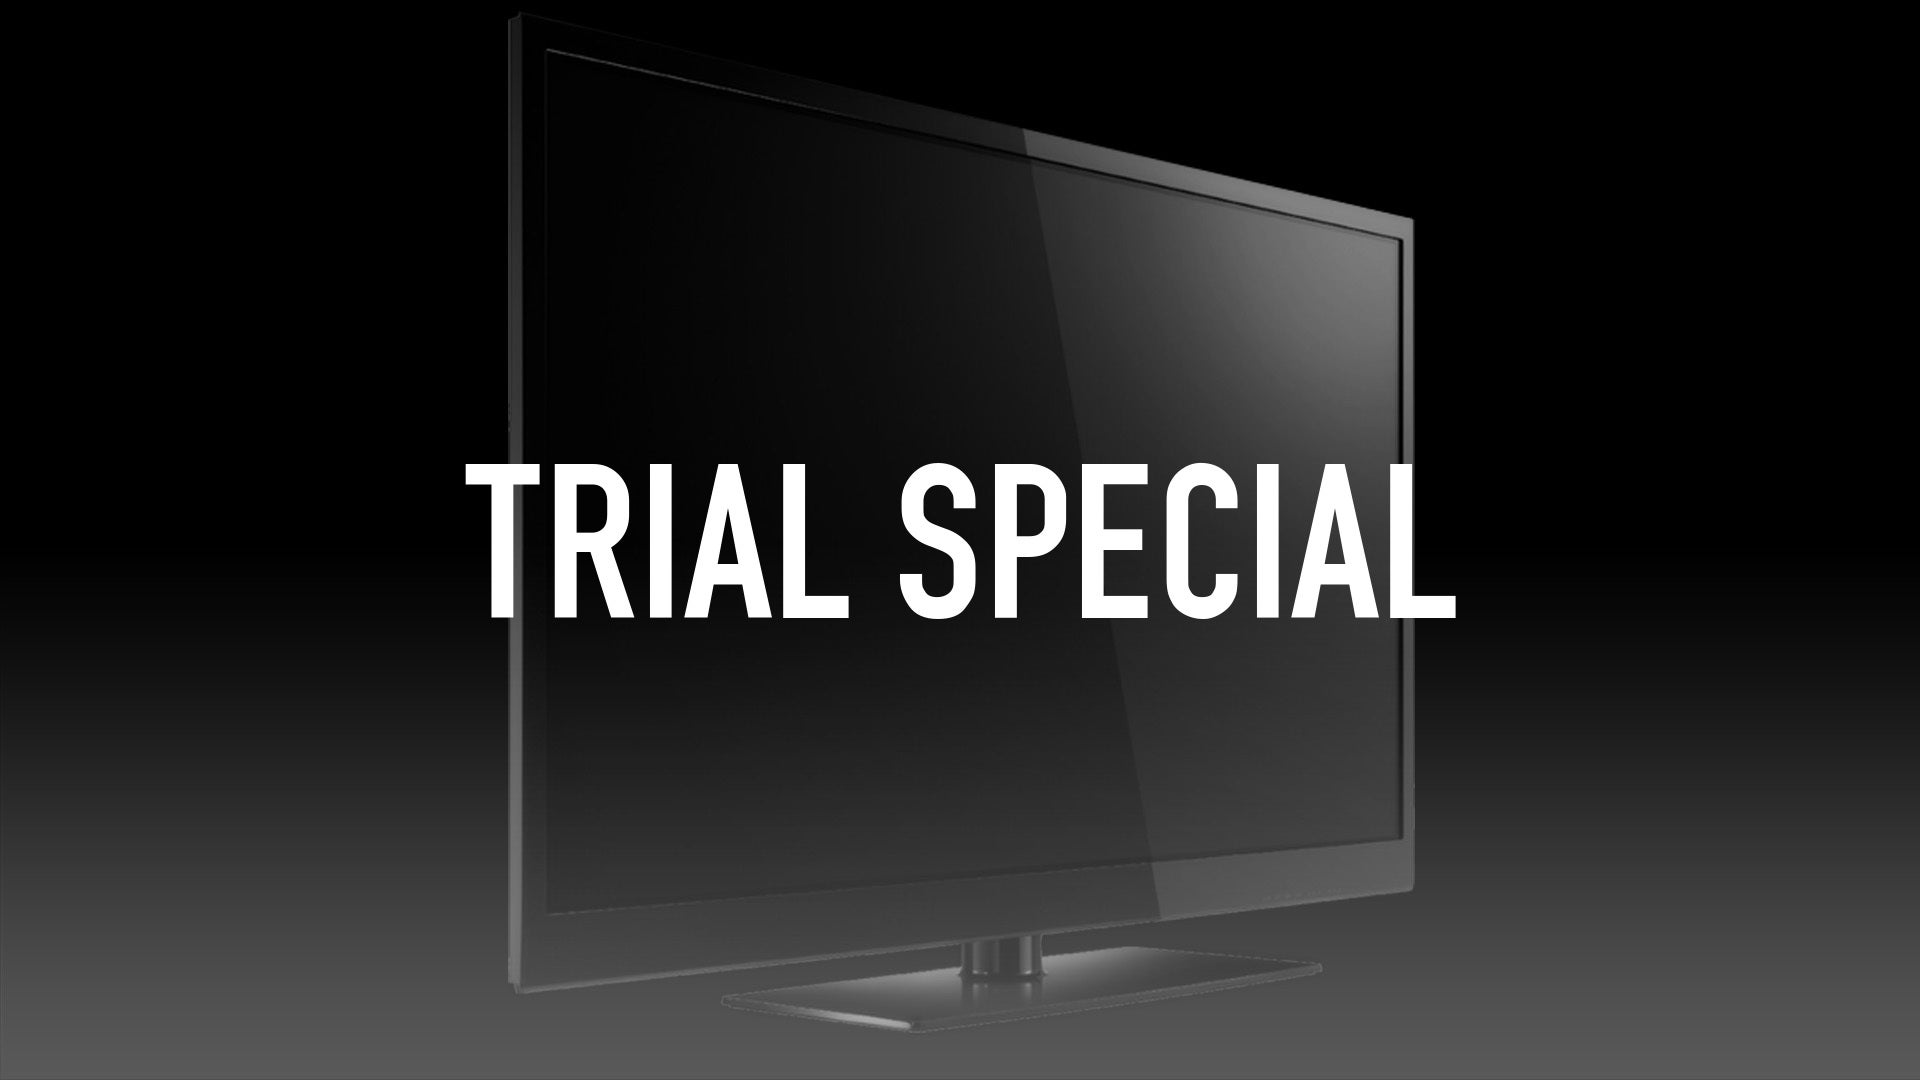 Trial Special